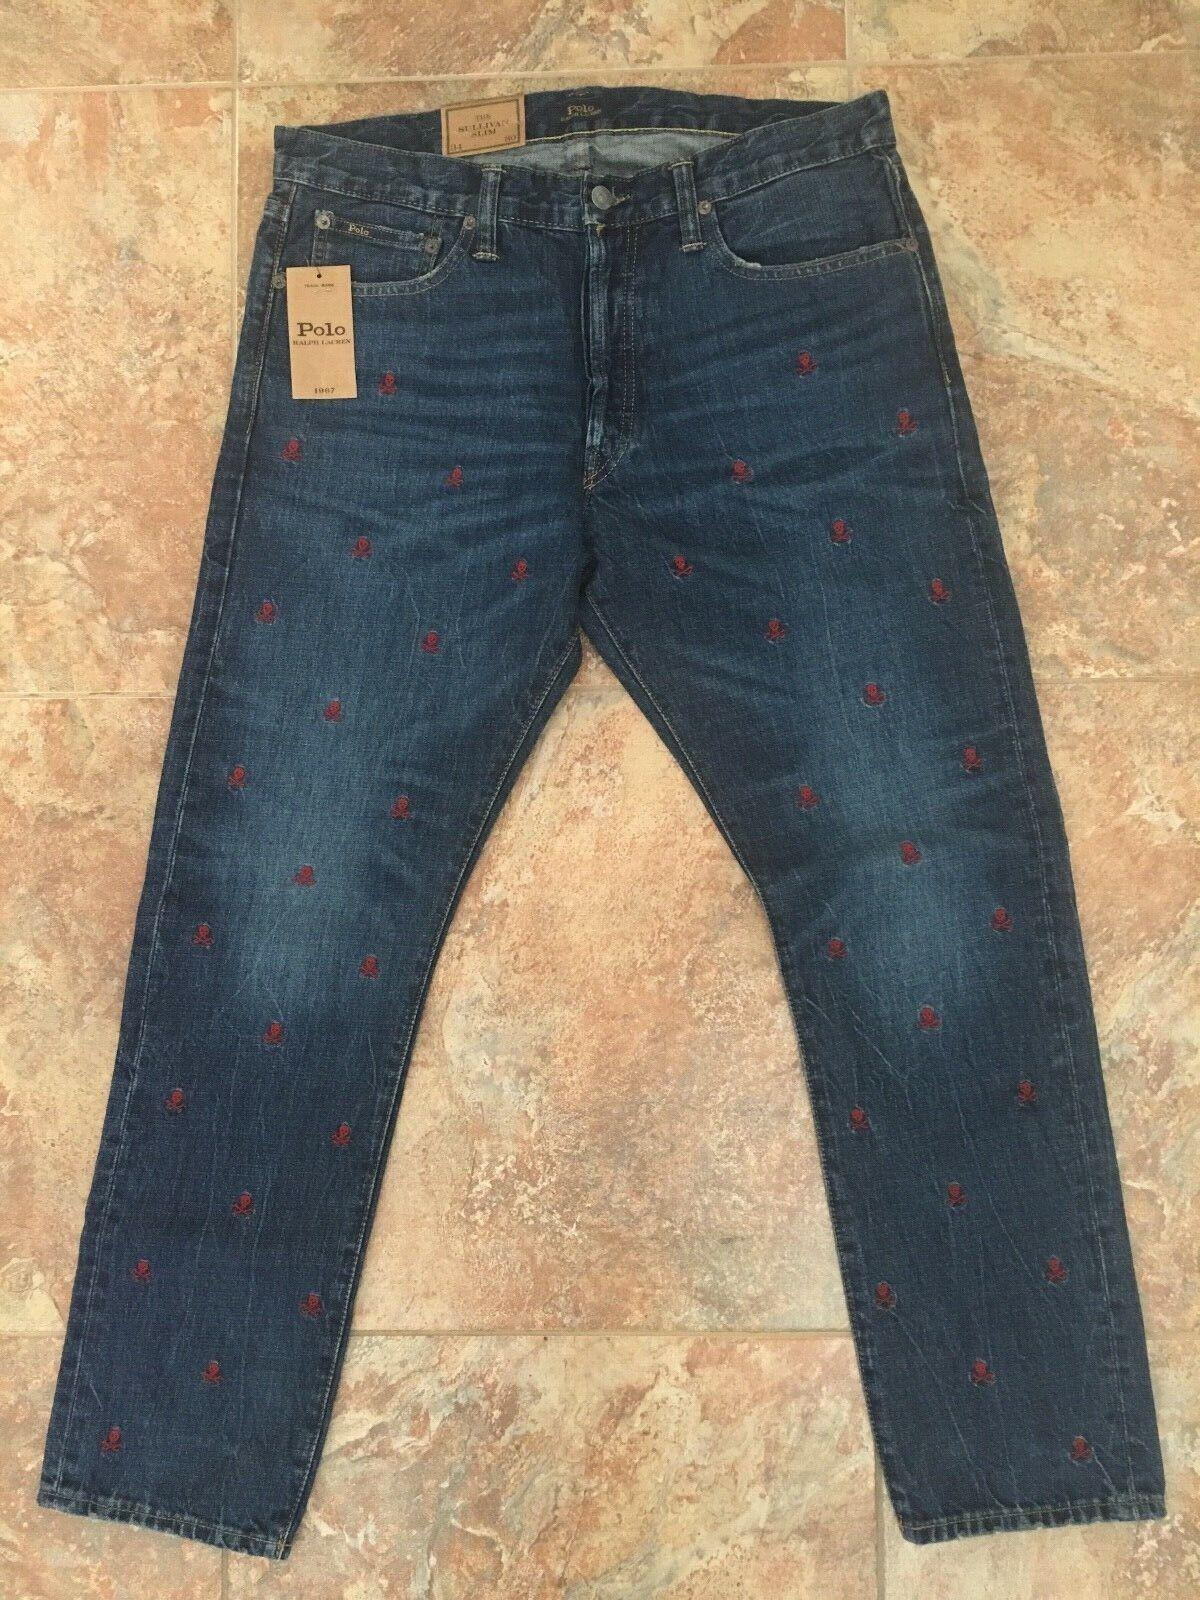 Polo Ralph Lauren Sullivan Slim Embroider Skeleton Mens bluee Jeans Pants 34 x 30